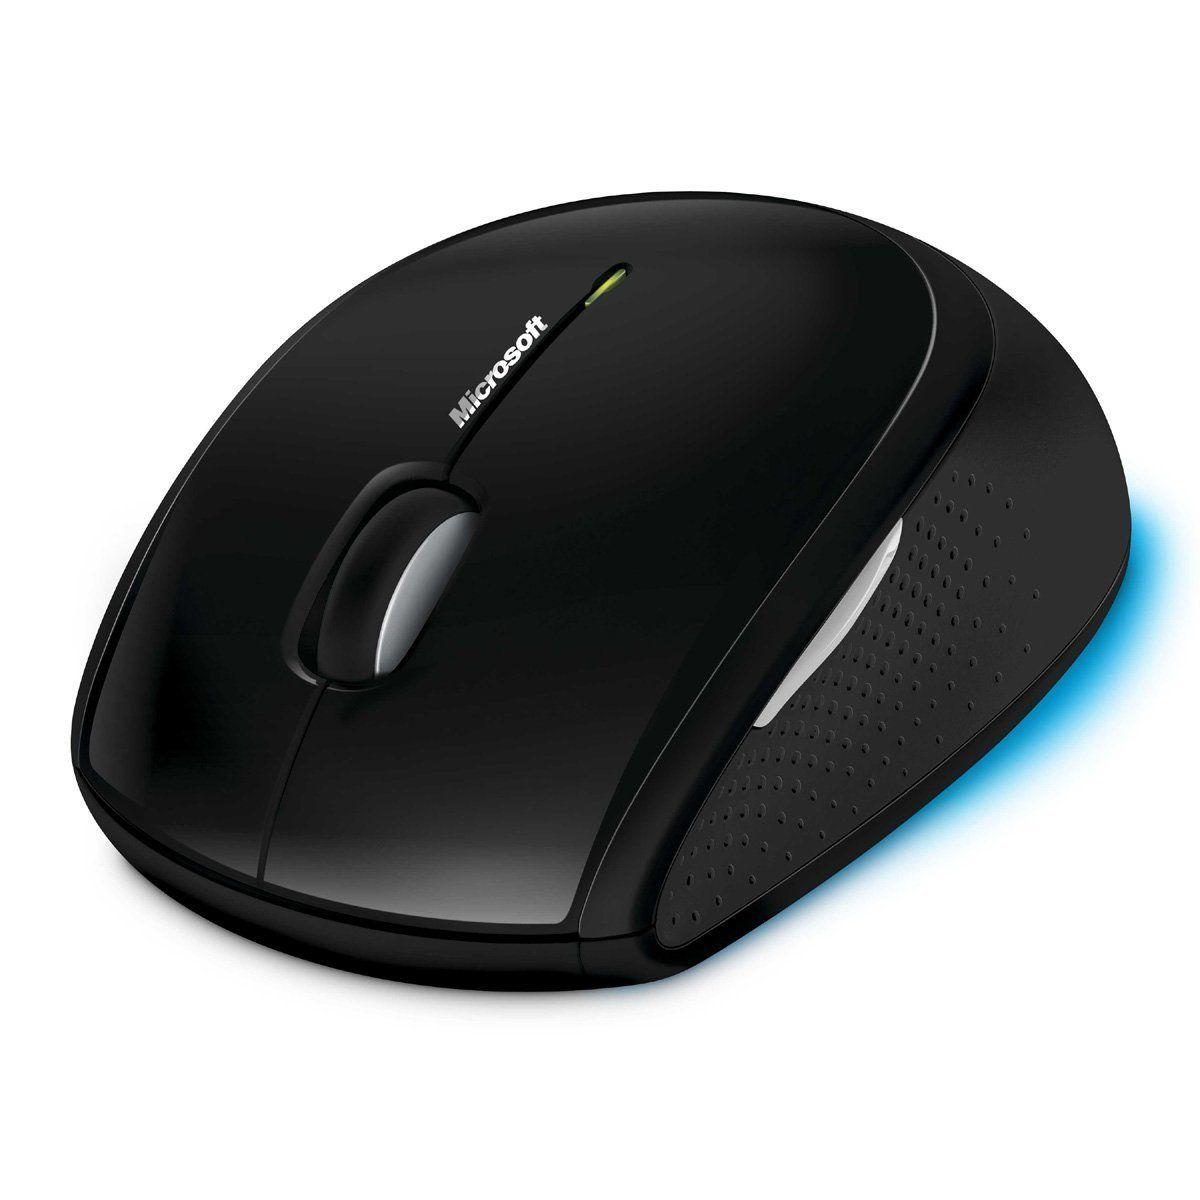 Microsoft Wireless Comfort Desktop 5000 Keyboard and Mouse - Black 1